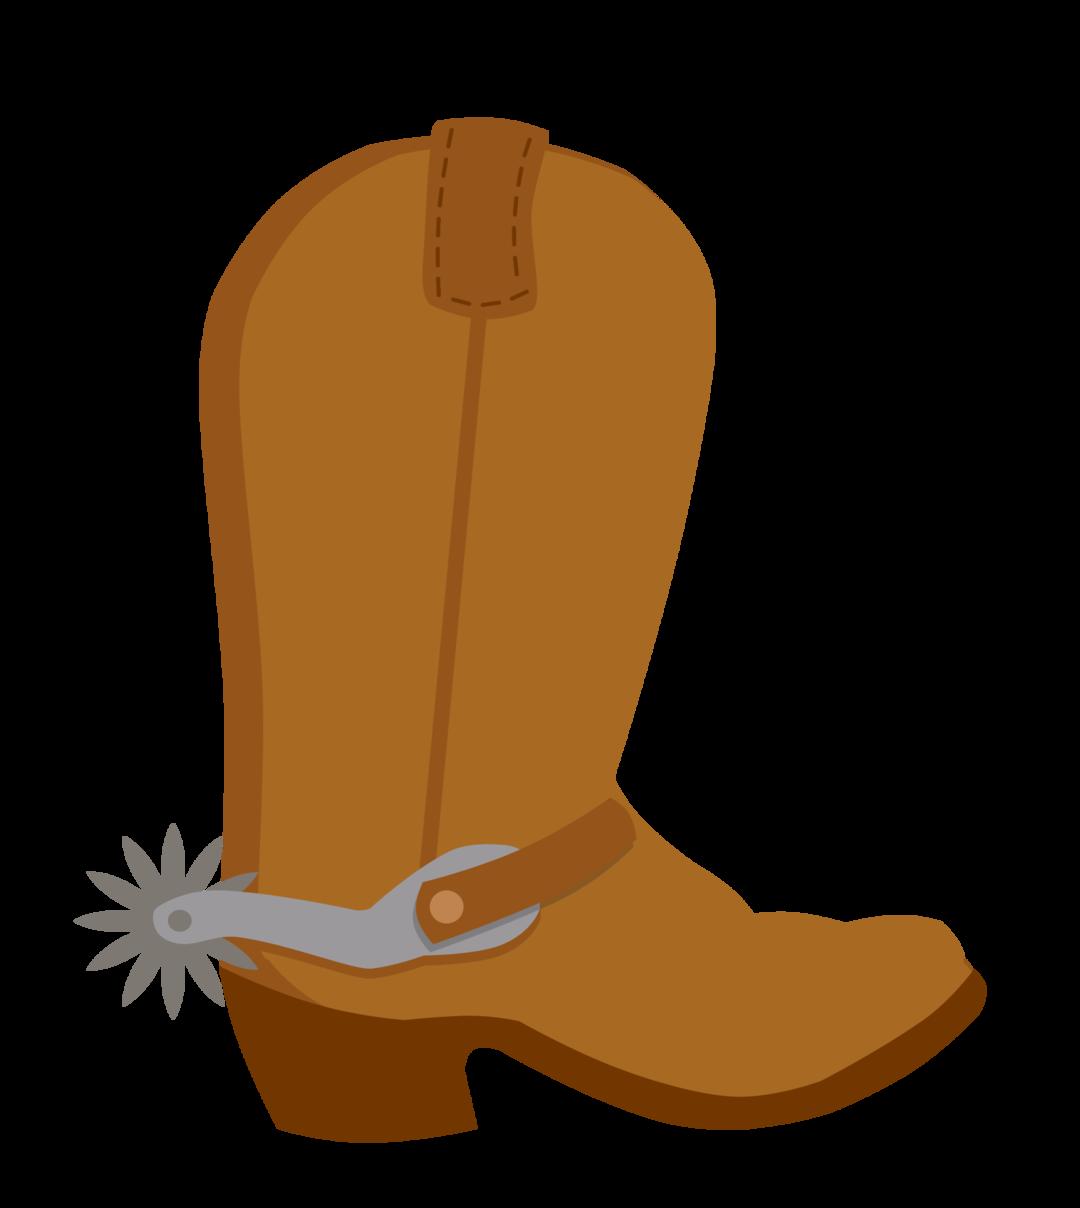 1080x1208 Cowboy Boot Botawboy Wboy Boot Untry Western Velho Oeste Clipart